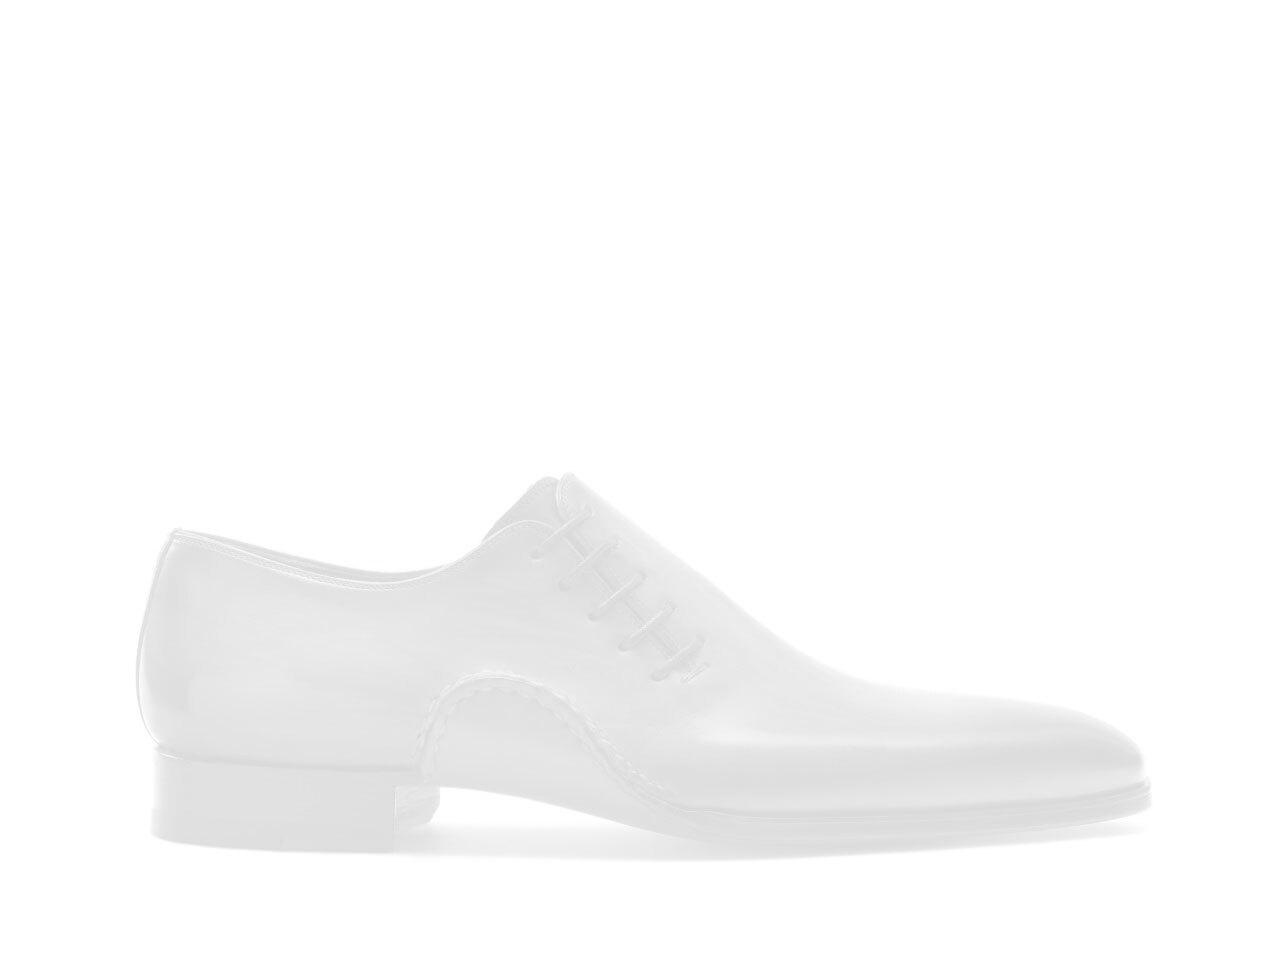 Sole of the Magnanni Garrett II Jean Suede Men's Double Monk Strap Shoes